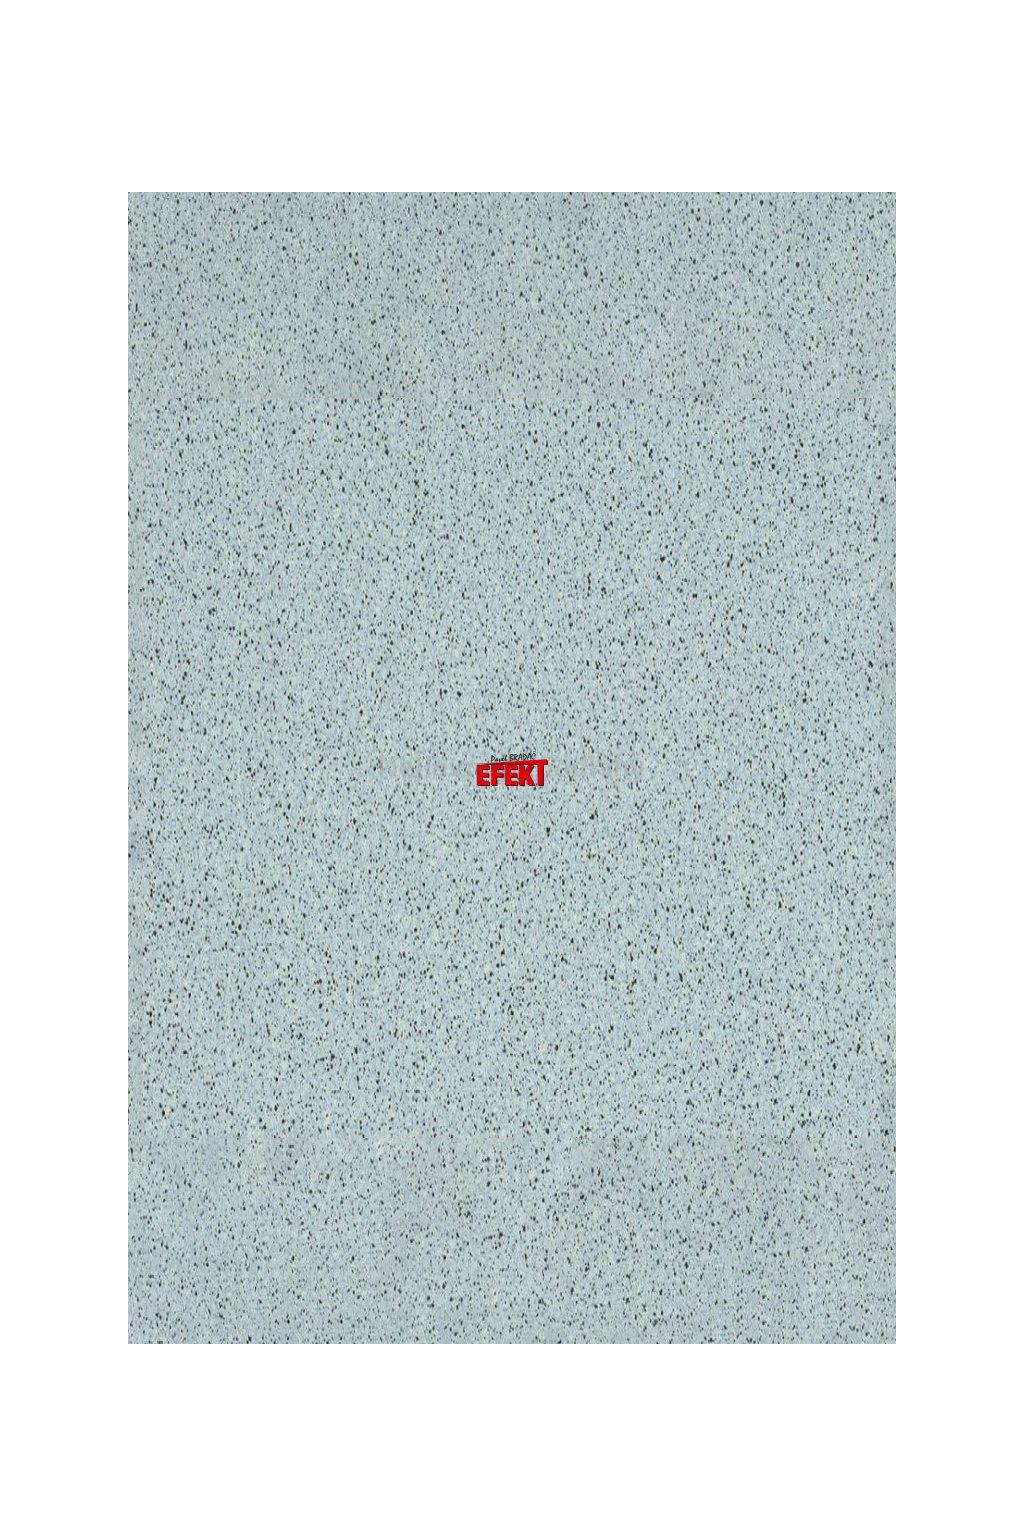 Gerflor Timberline Pixel Sky 2177